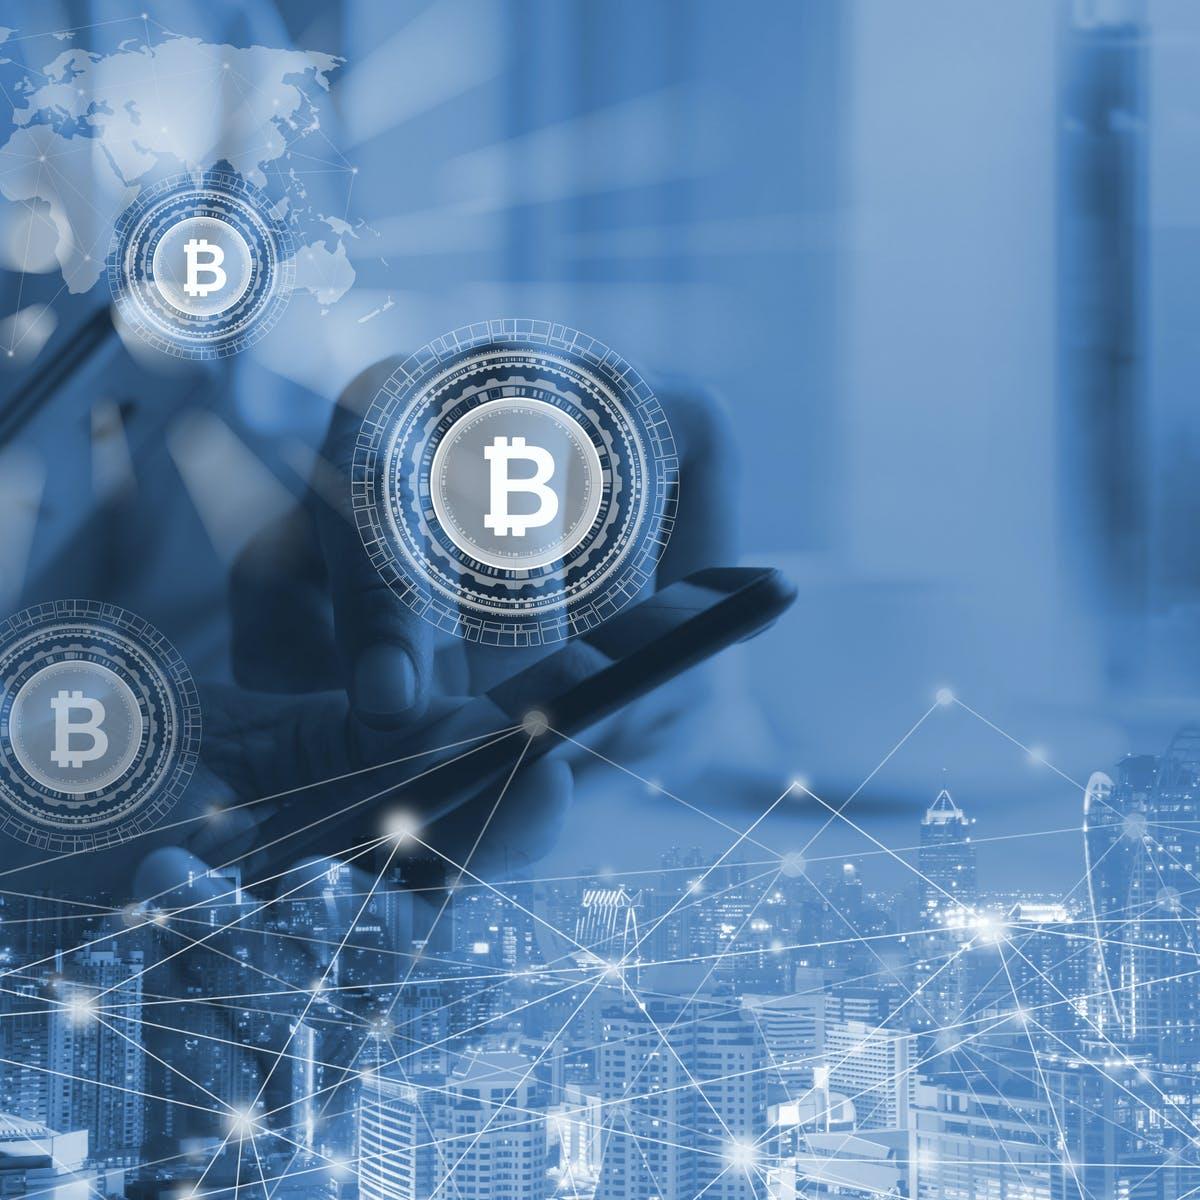 Future Development in Supply Chain Finance and Blockchain Technology